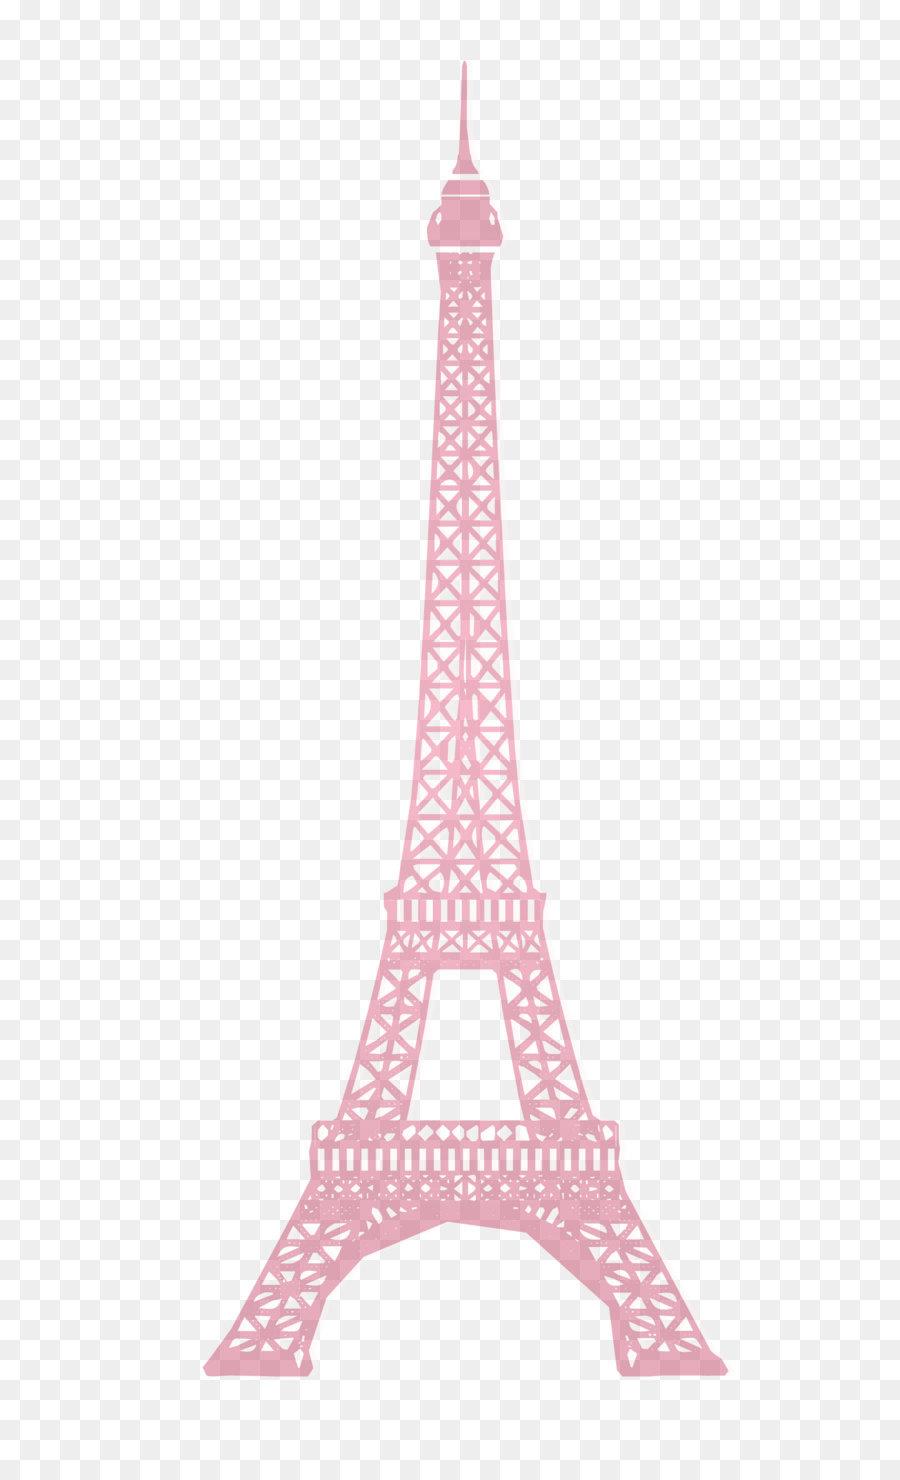 Eiffel Tower Silhouette Eiffel Tower Png Download 1117 2509 Free Transparent Eiffel Tower Png Download Cuartos